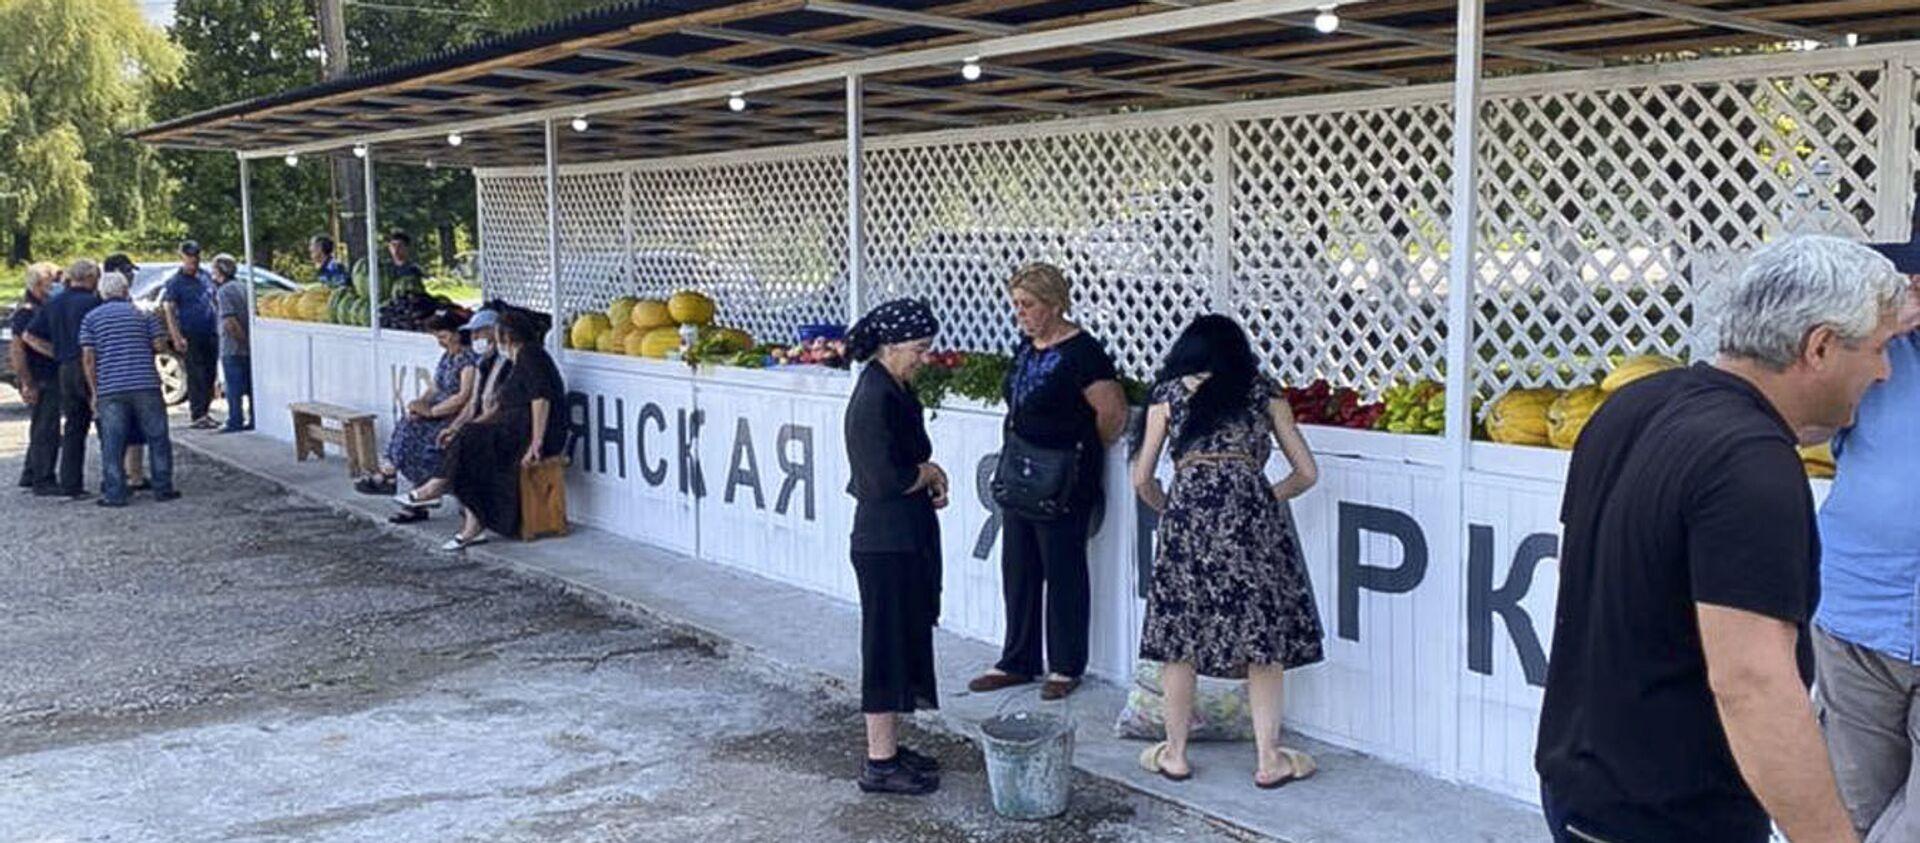 Cельхоз ярмарка открылась в селе Ачгуара - Sputnik Абхазия, 1920, 17.08.2021